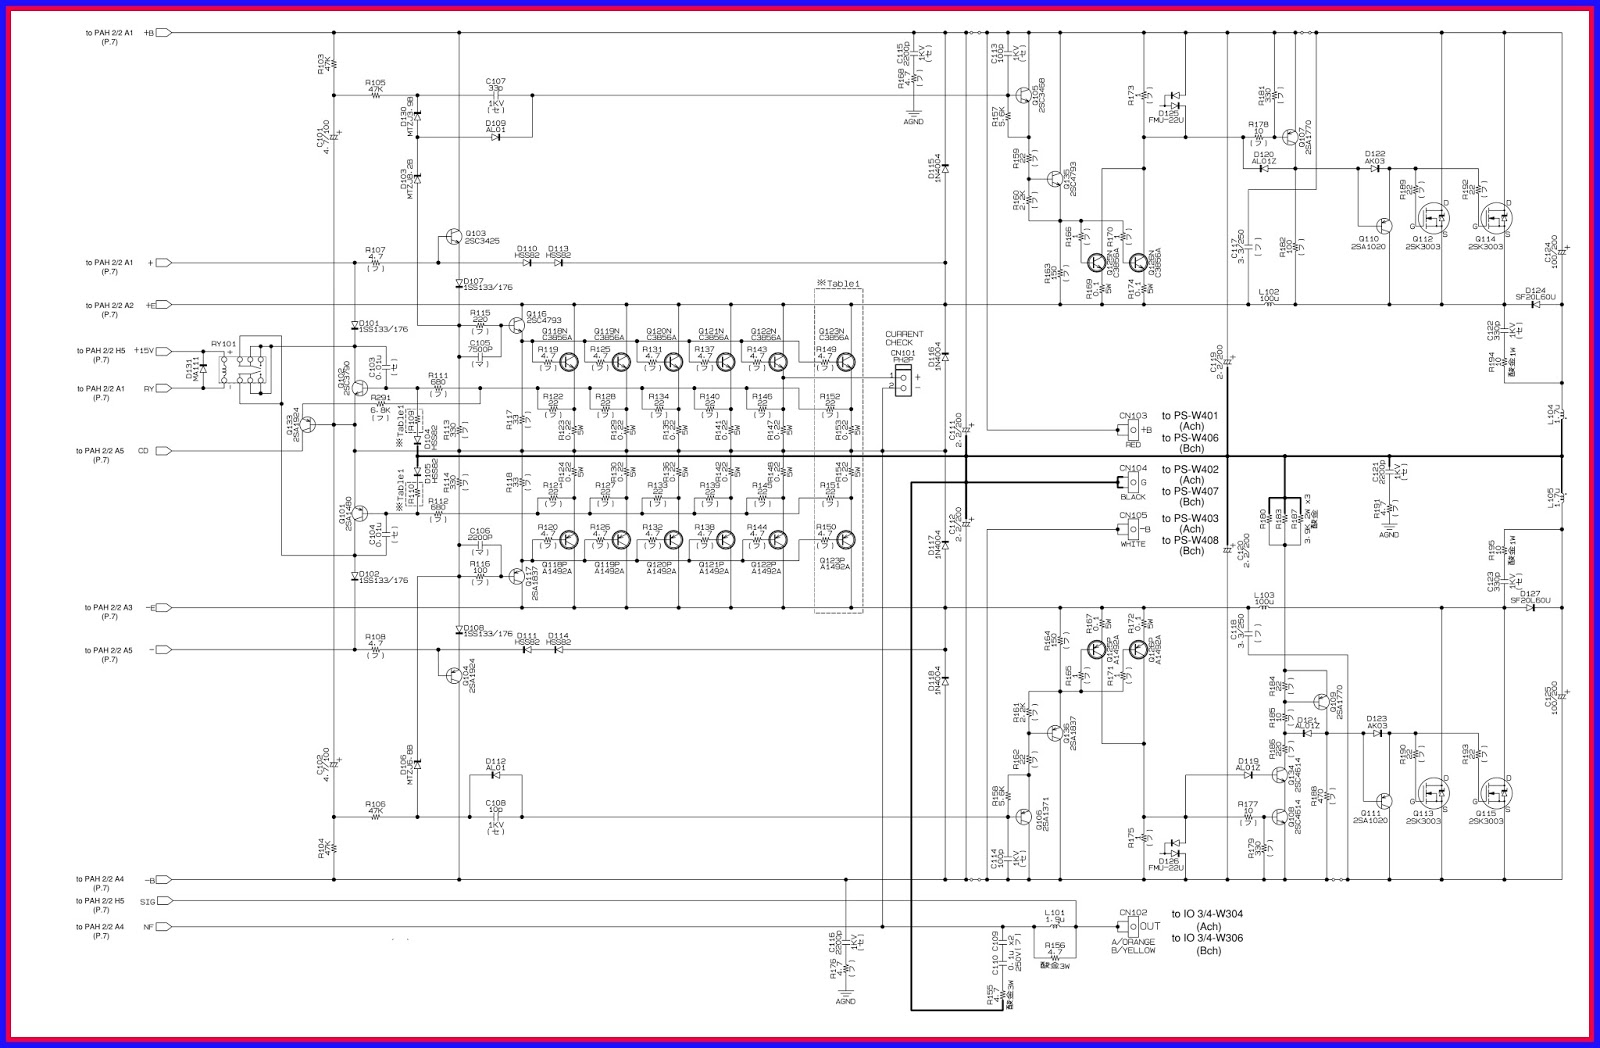 small resolution of yamaha amp schematic wiring diagram megayamaha amp schematic wiring diagram yamaha amp schematics yamaha amp schematic